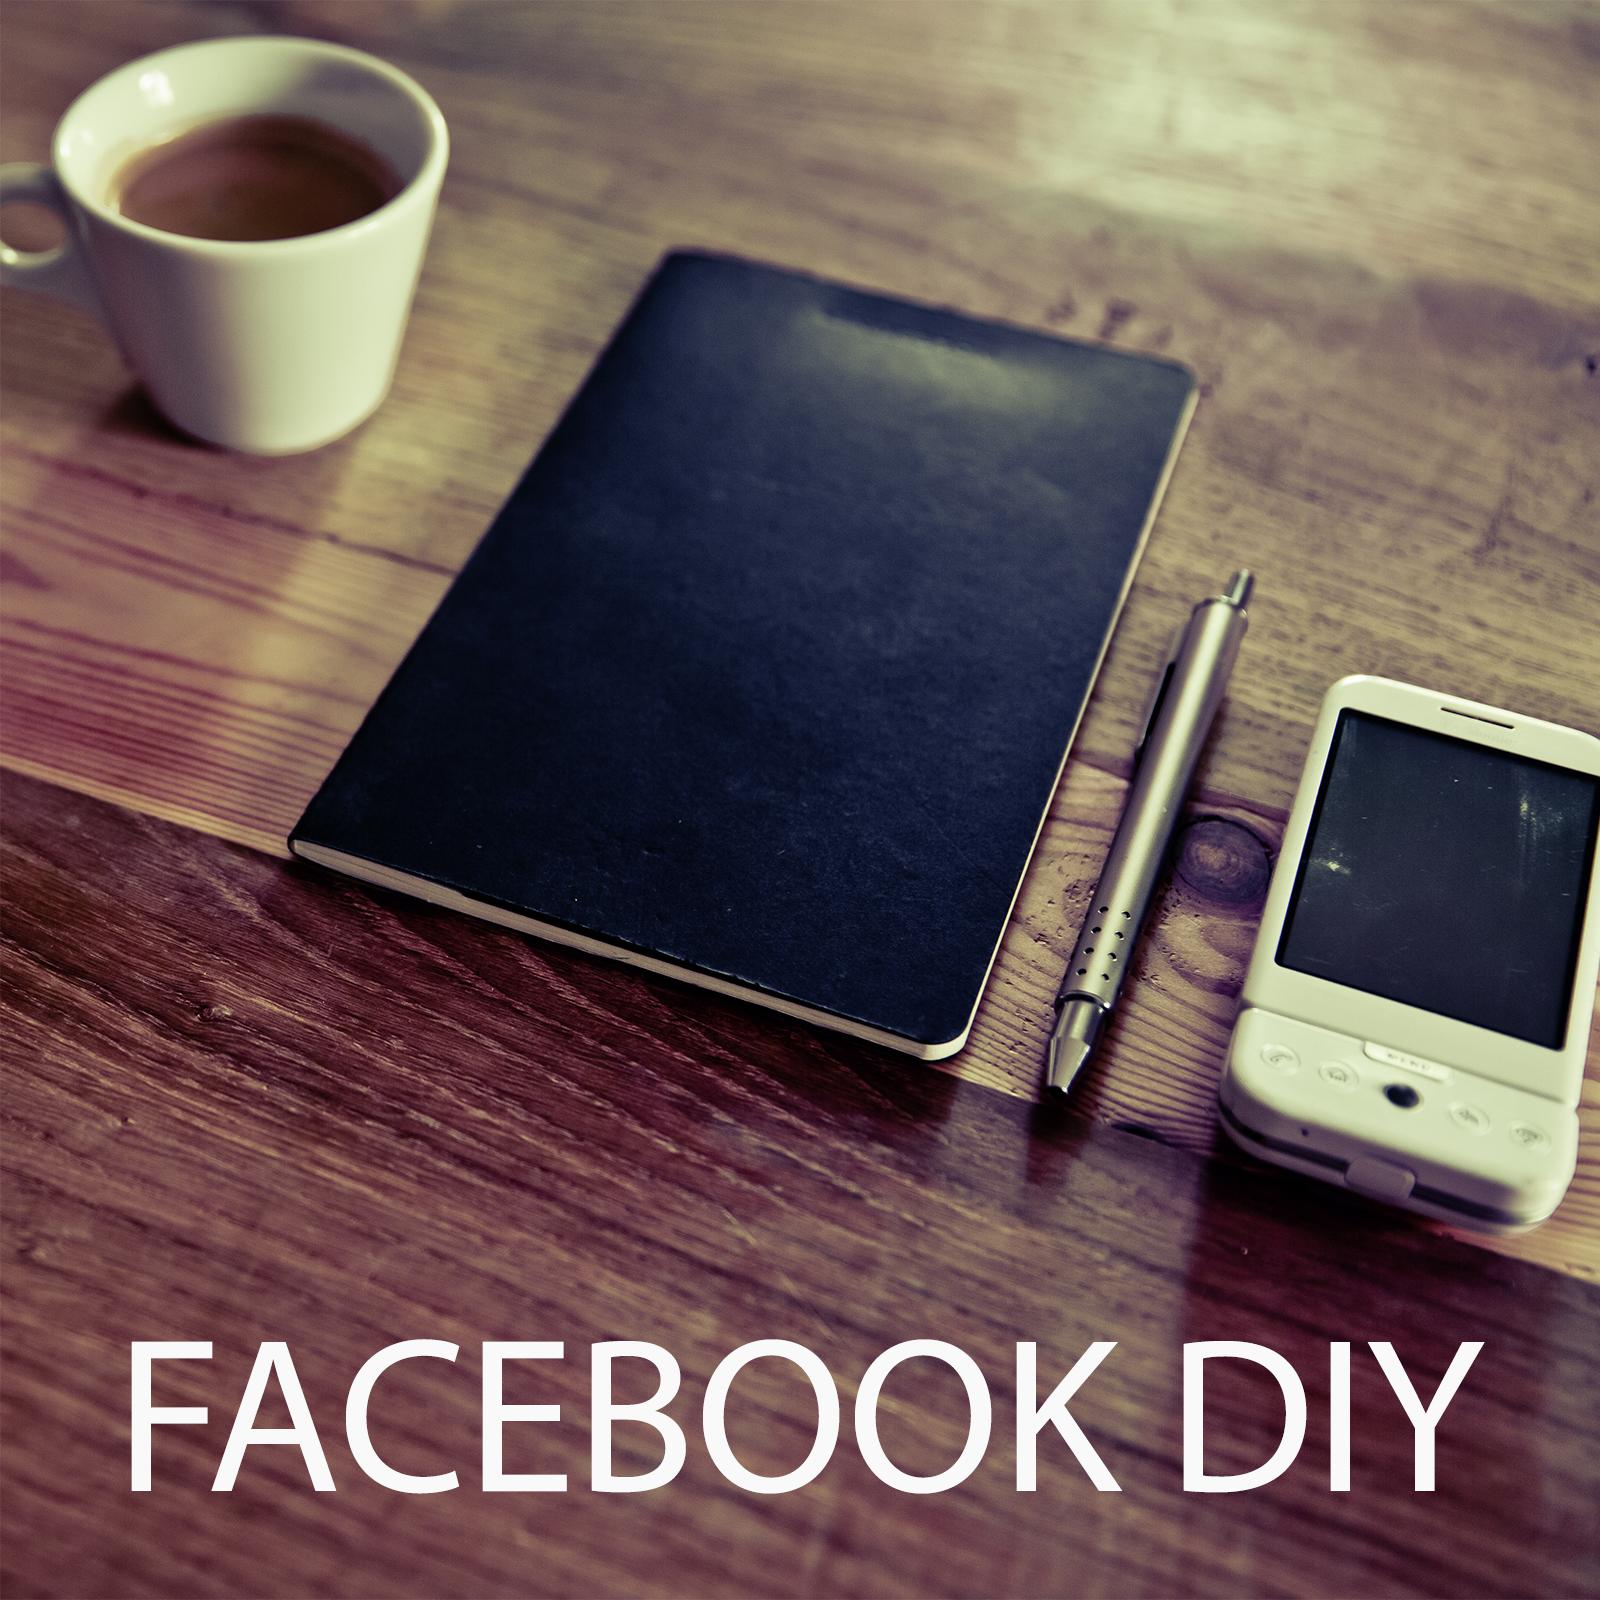 Recepta na Facebook'owy wpis idealny – 5 zasad